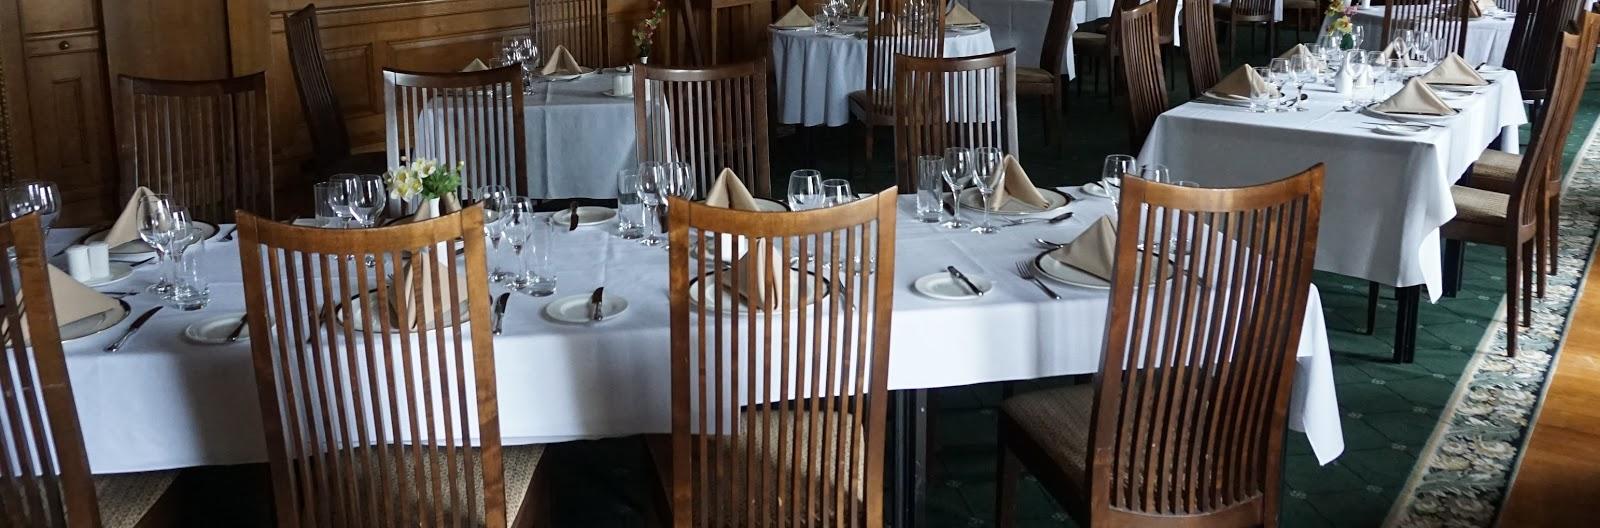 Members Dining Room Stormont